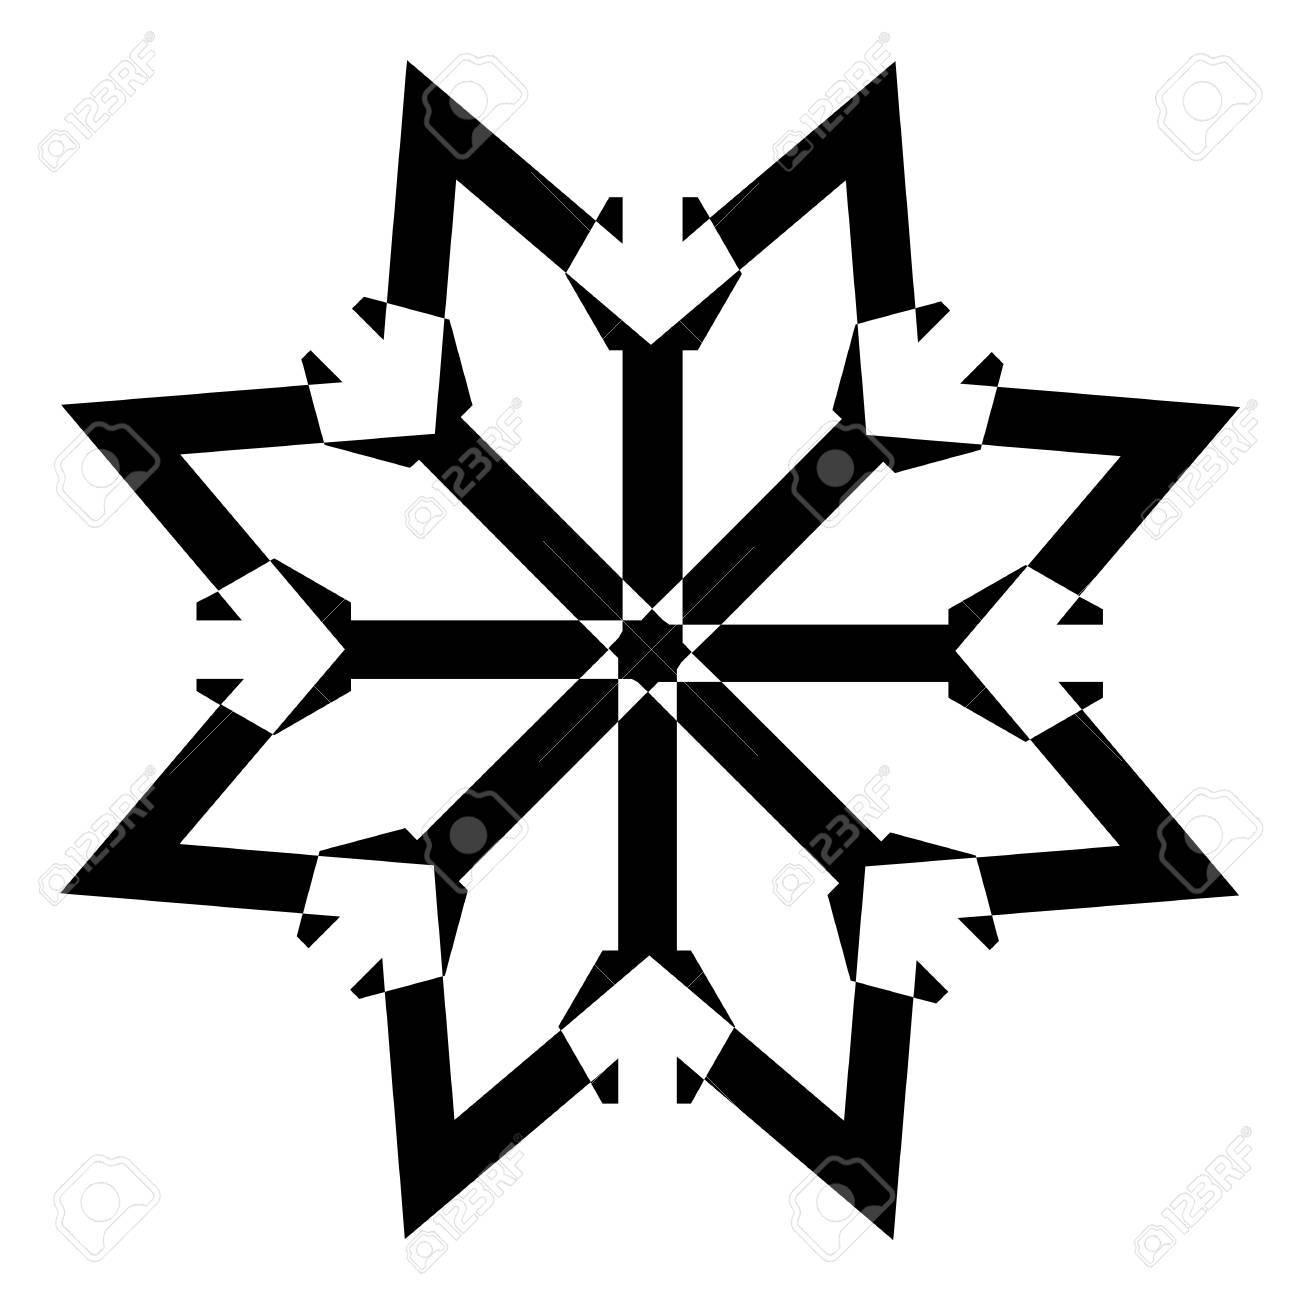 Snowflake Star Stock Vector - 16831741